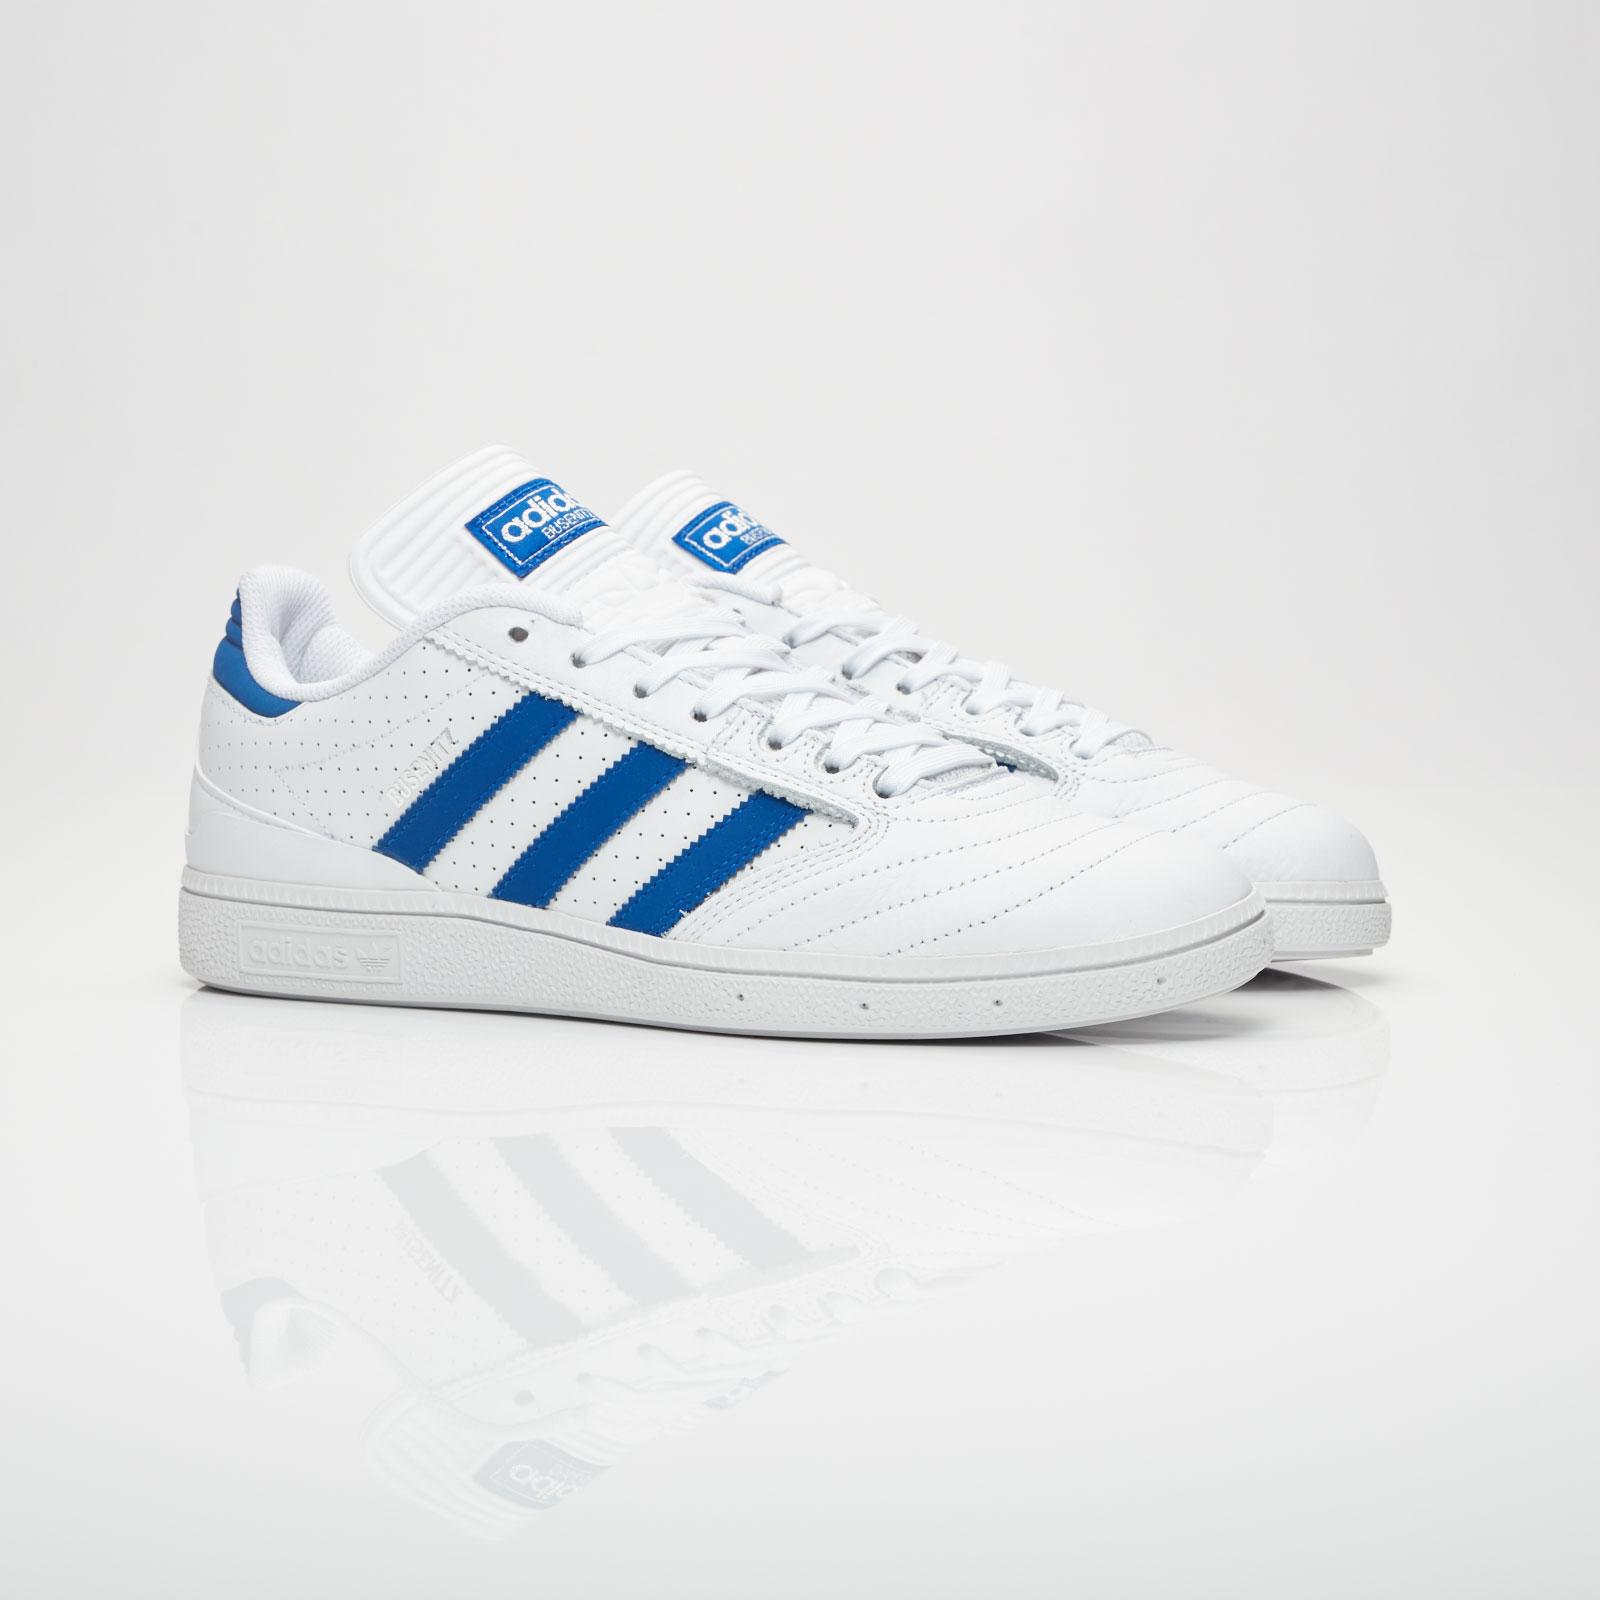 Adidas Busenitz Pro BY3971